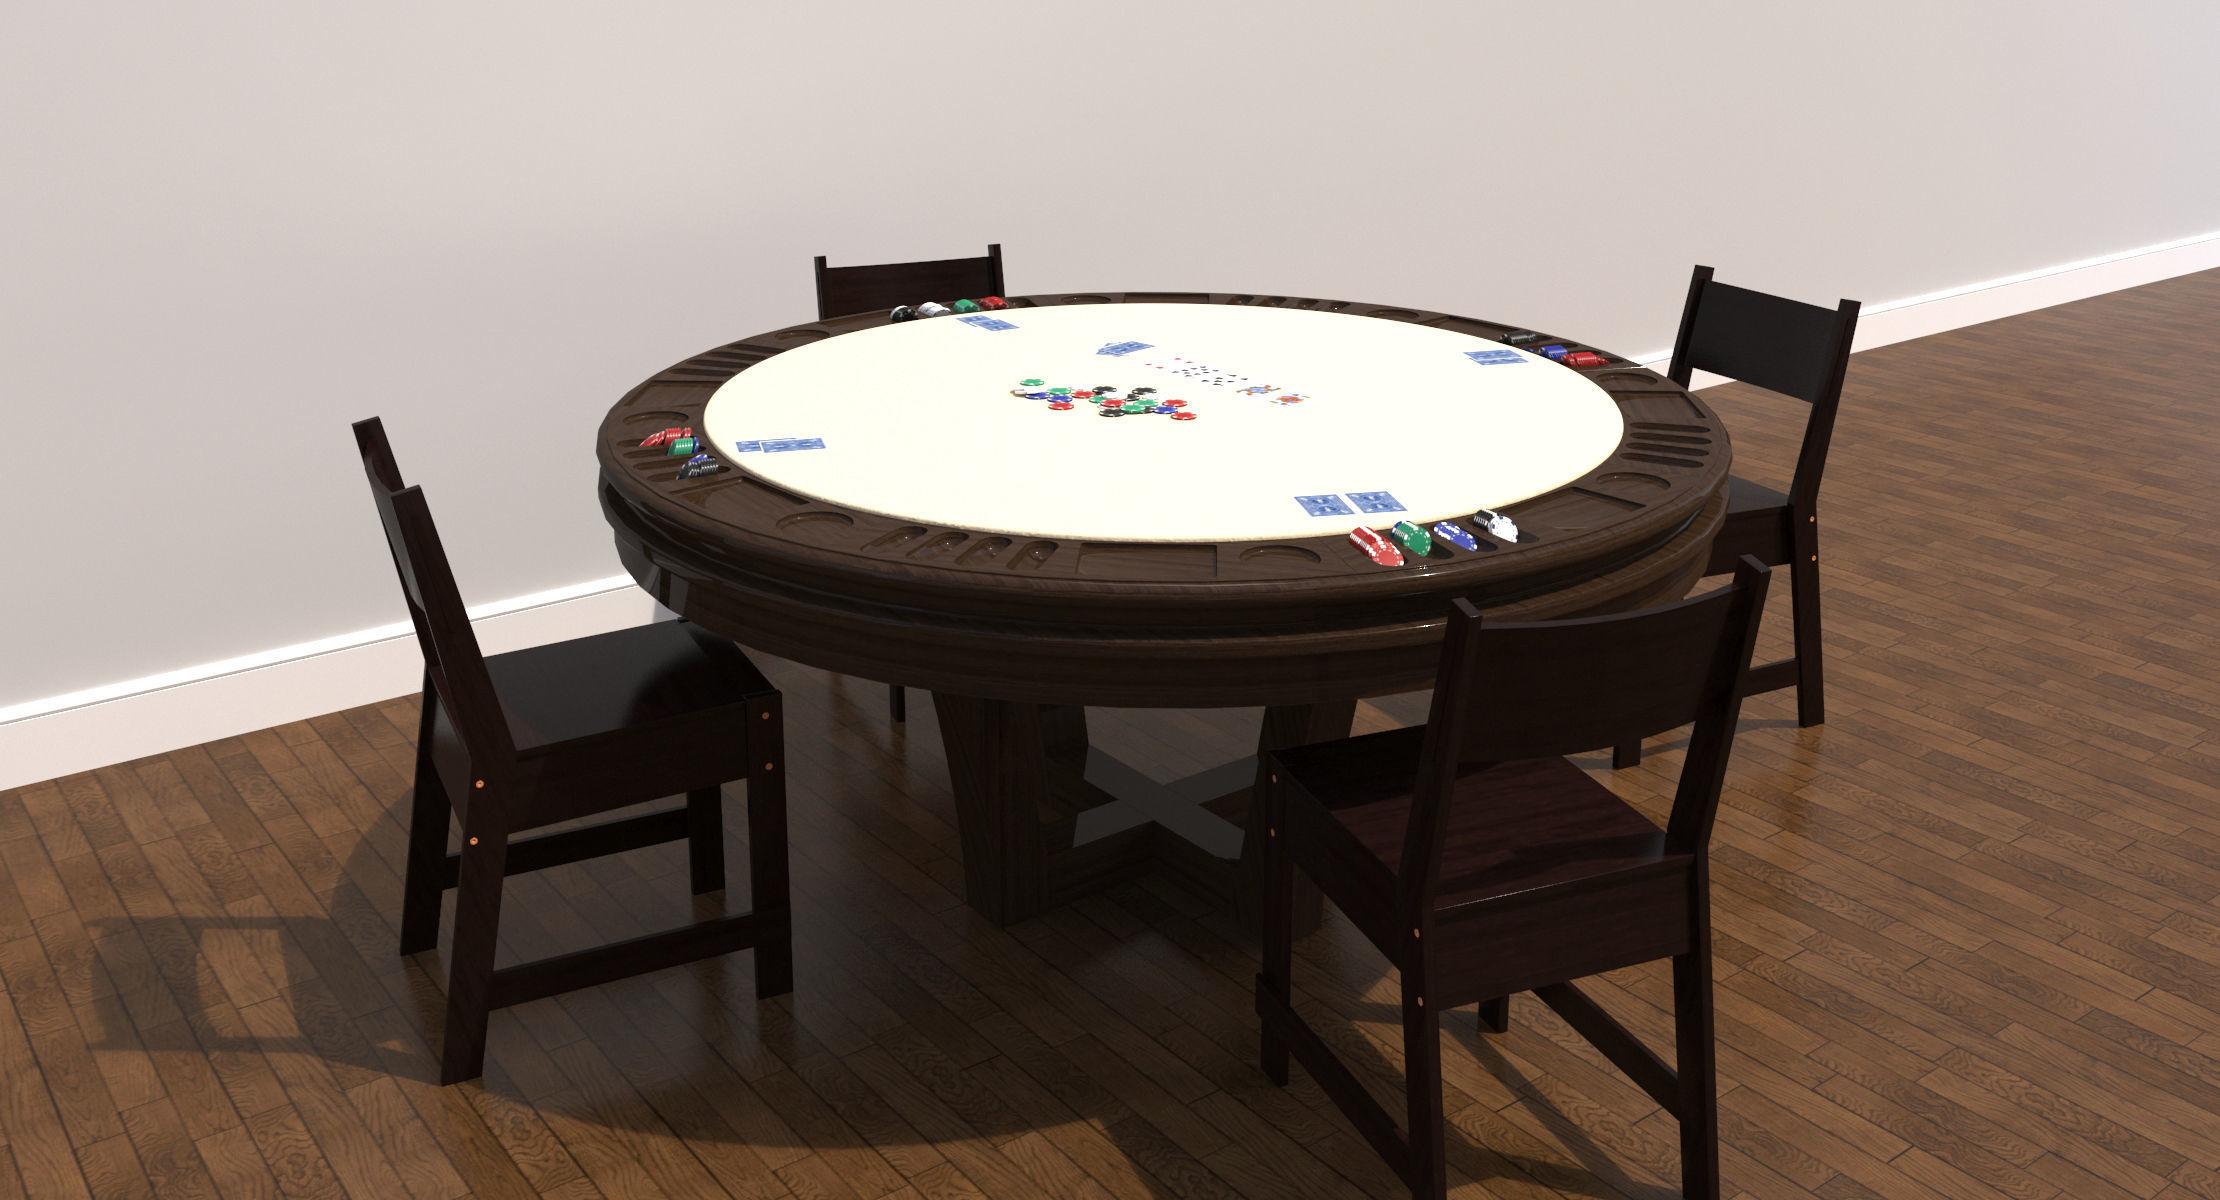 Geant Casino Table De Ping Pong - Pugymdunecysubs intérieur Table De Jardin Geant Casino